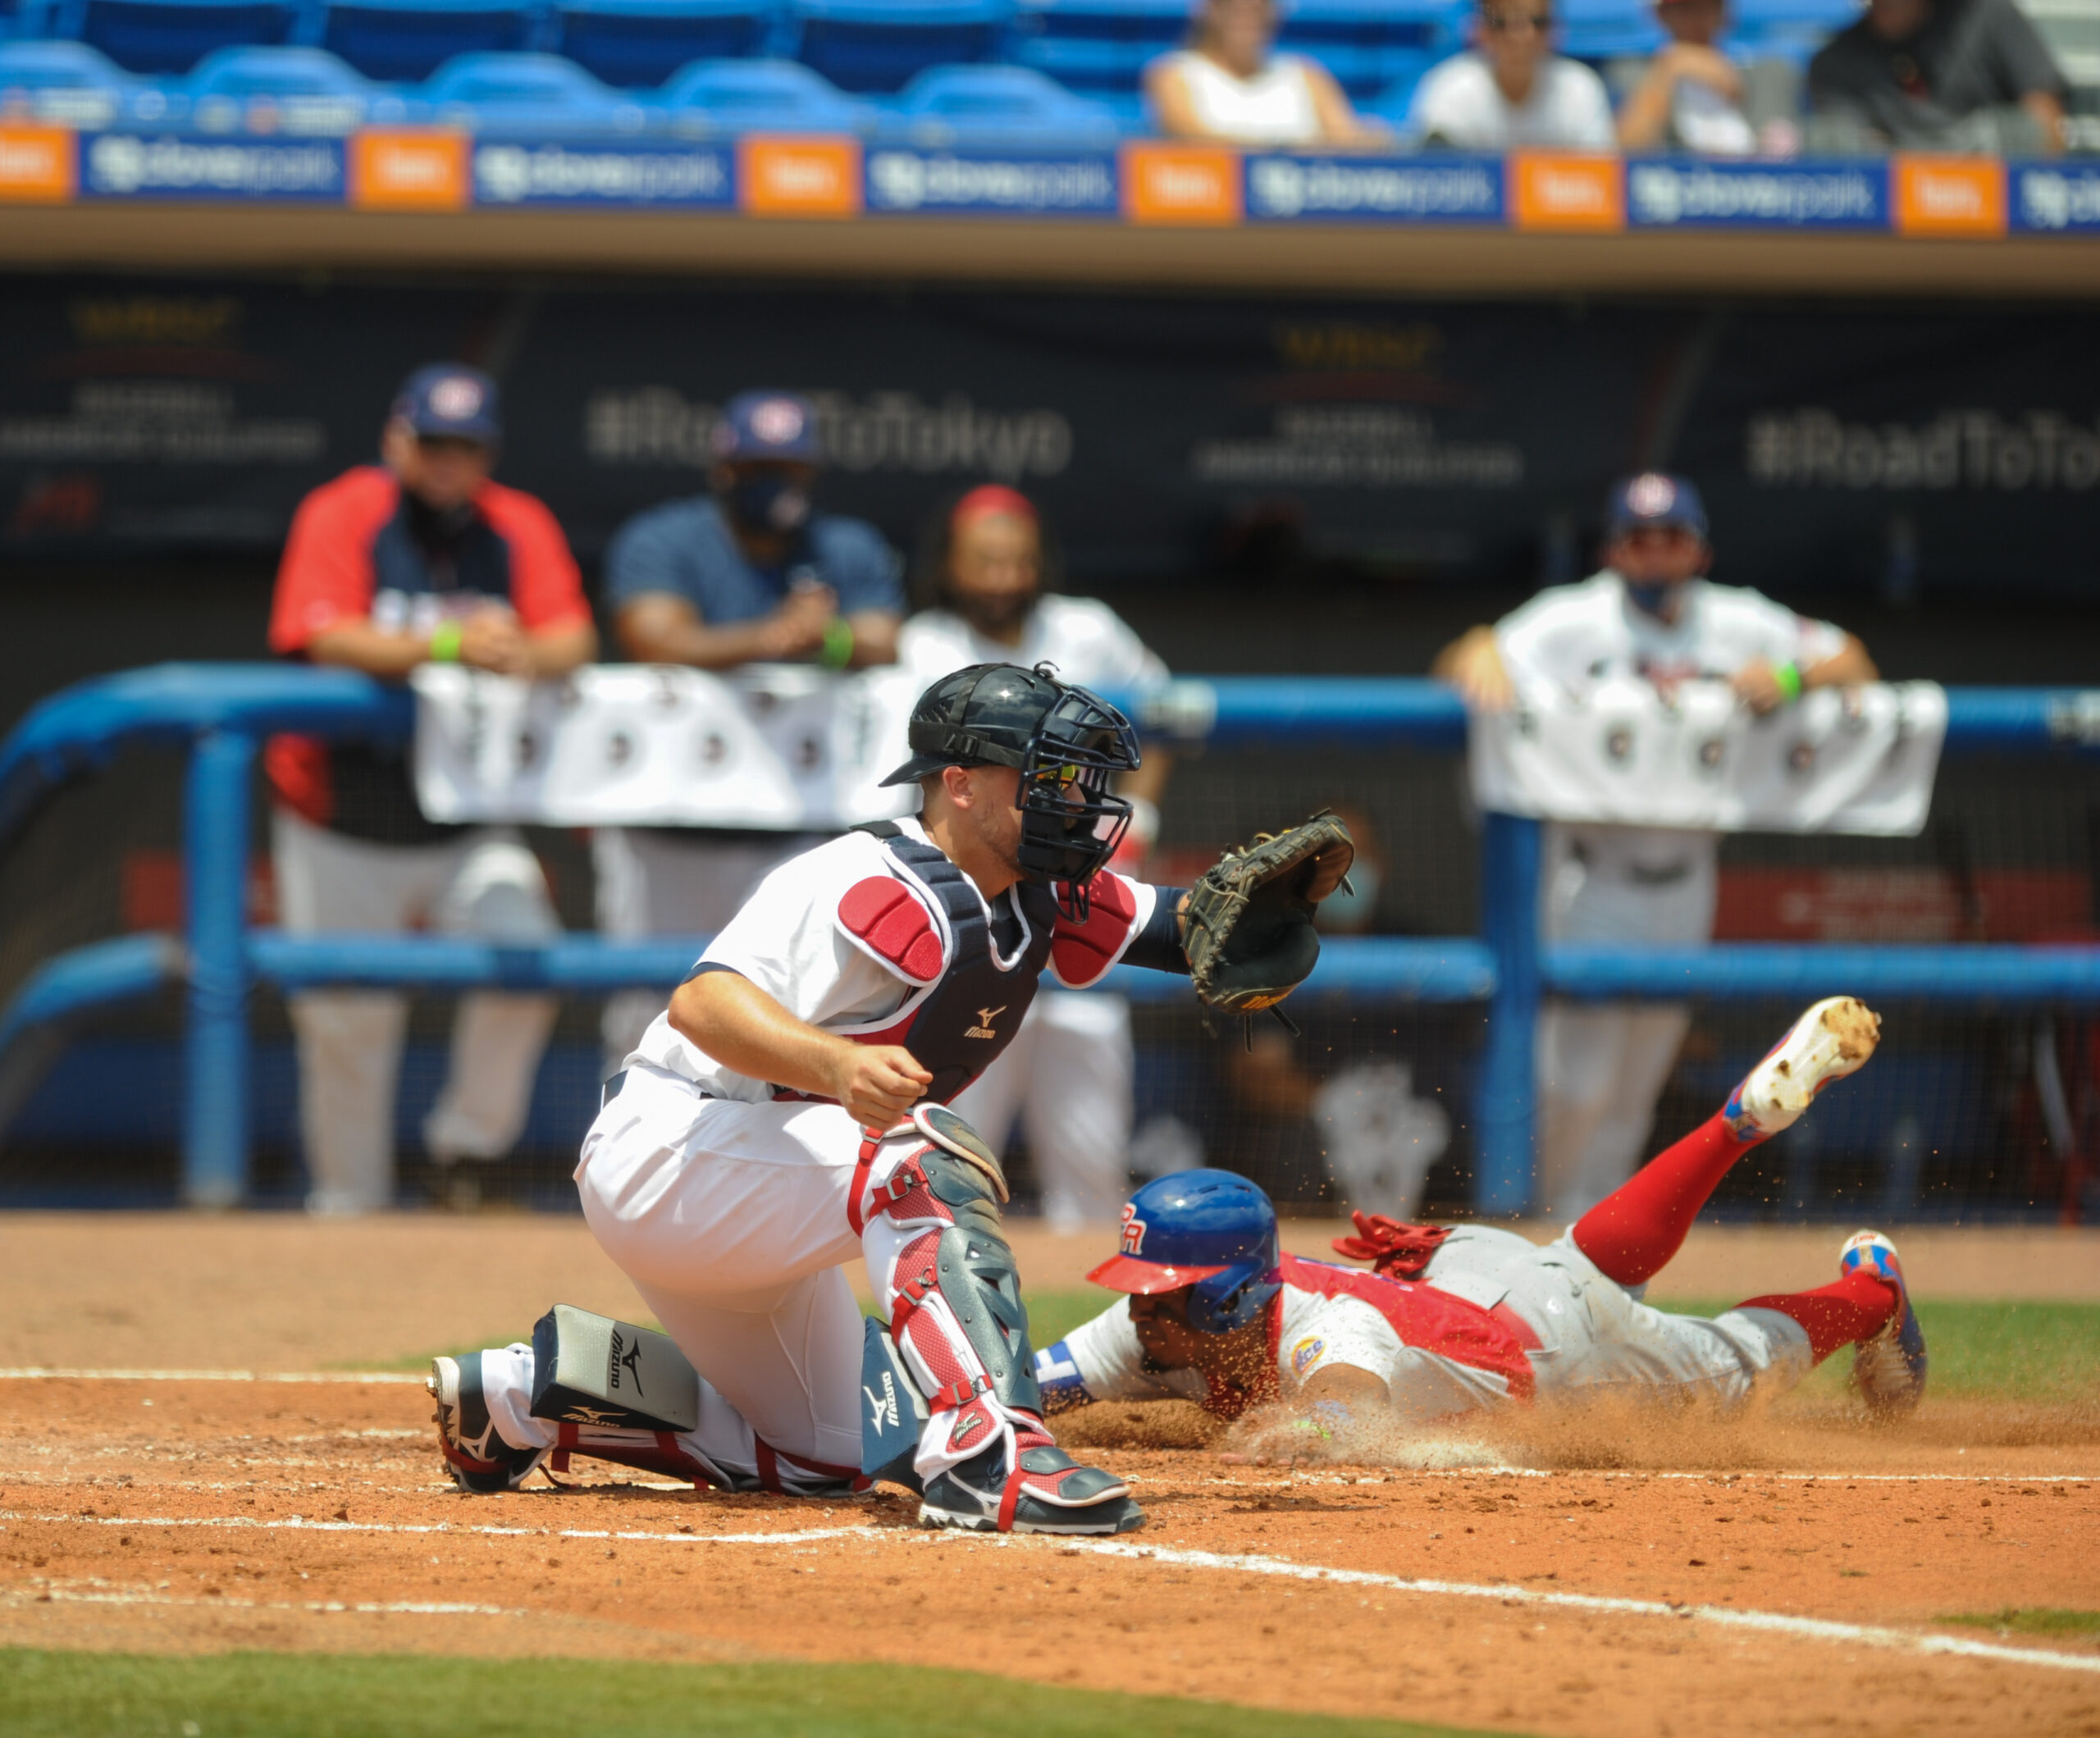 Cancelado último juego de Puerto Rico en Preolímpico de béisbol